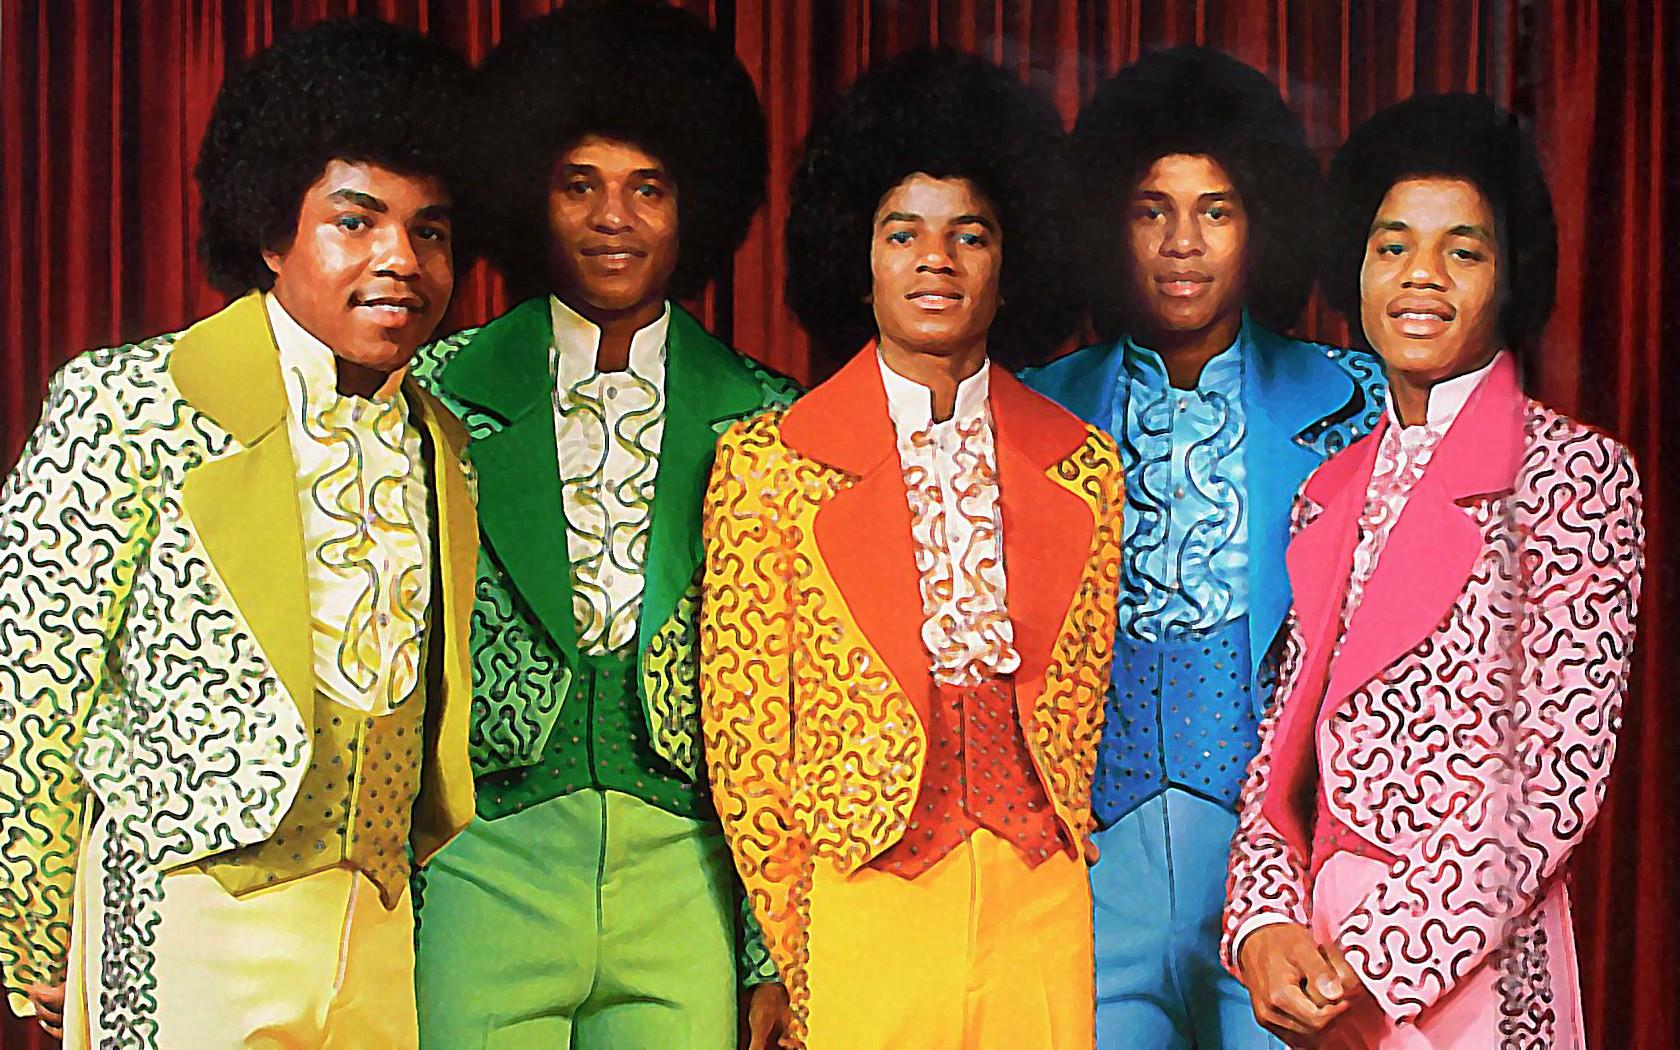 Jackson 5 costume 1.6 1680x1050 2